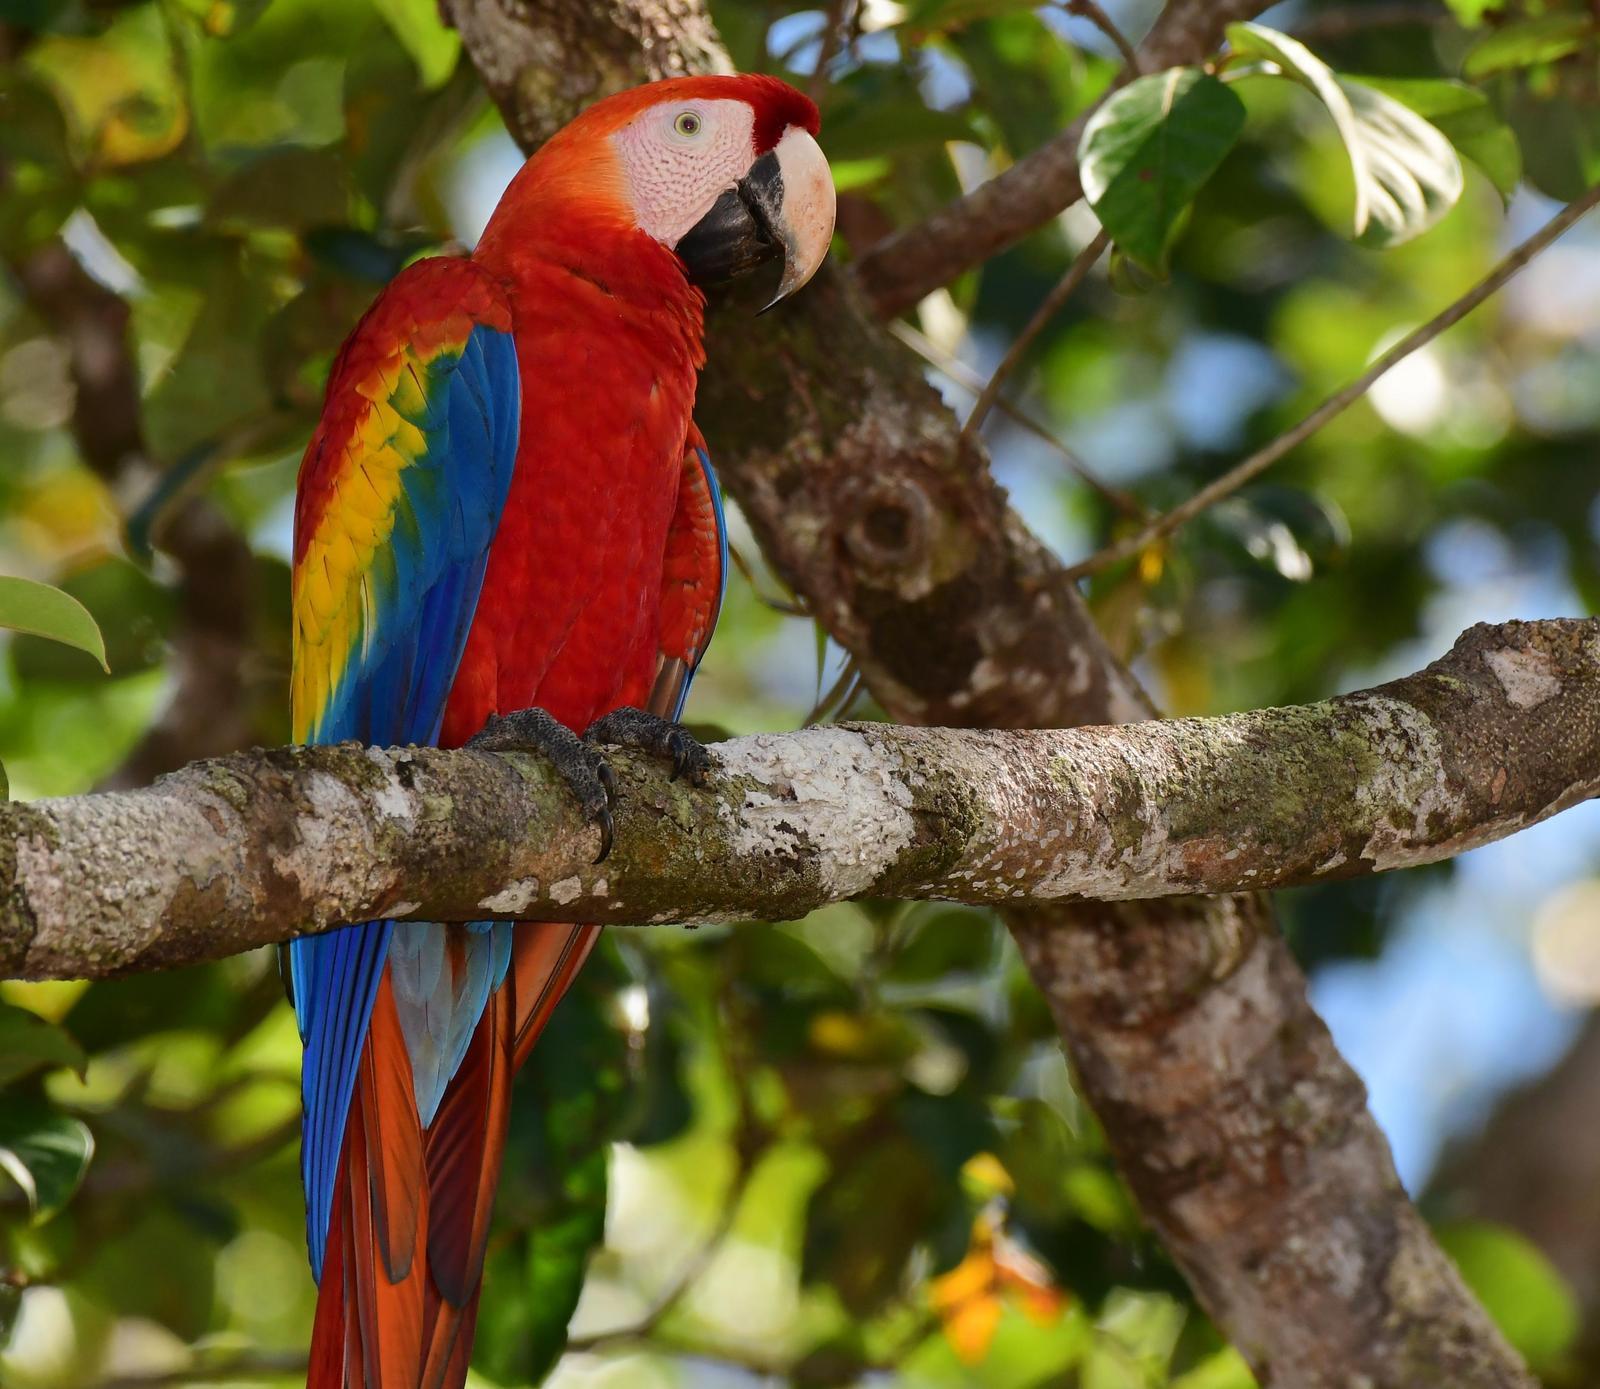 Scarlet Macaw Photo by Gareth Rasberry